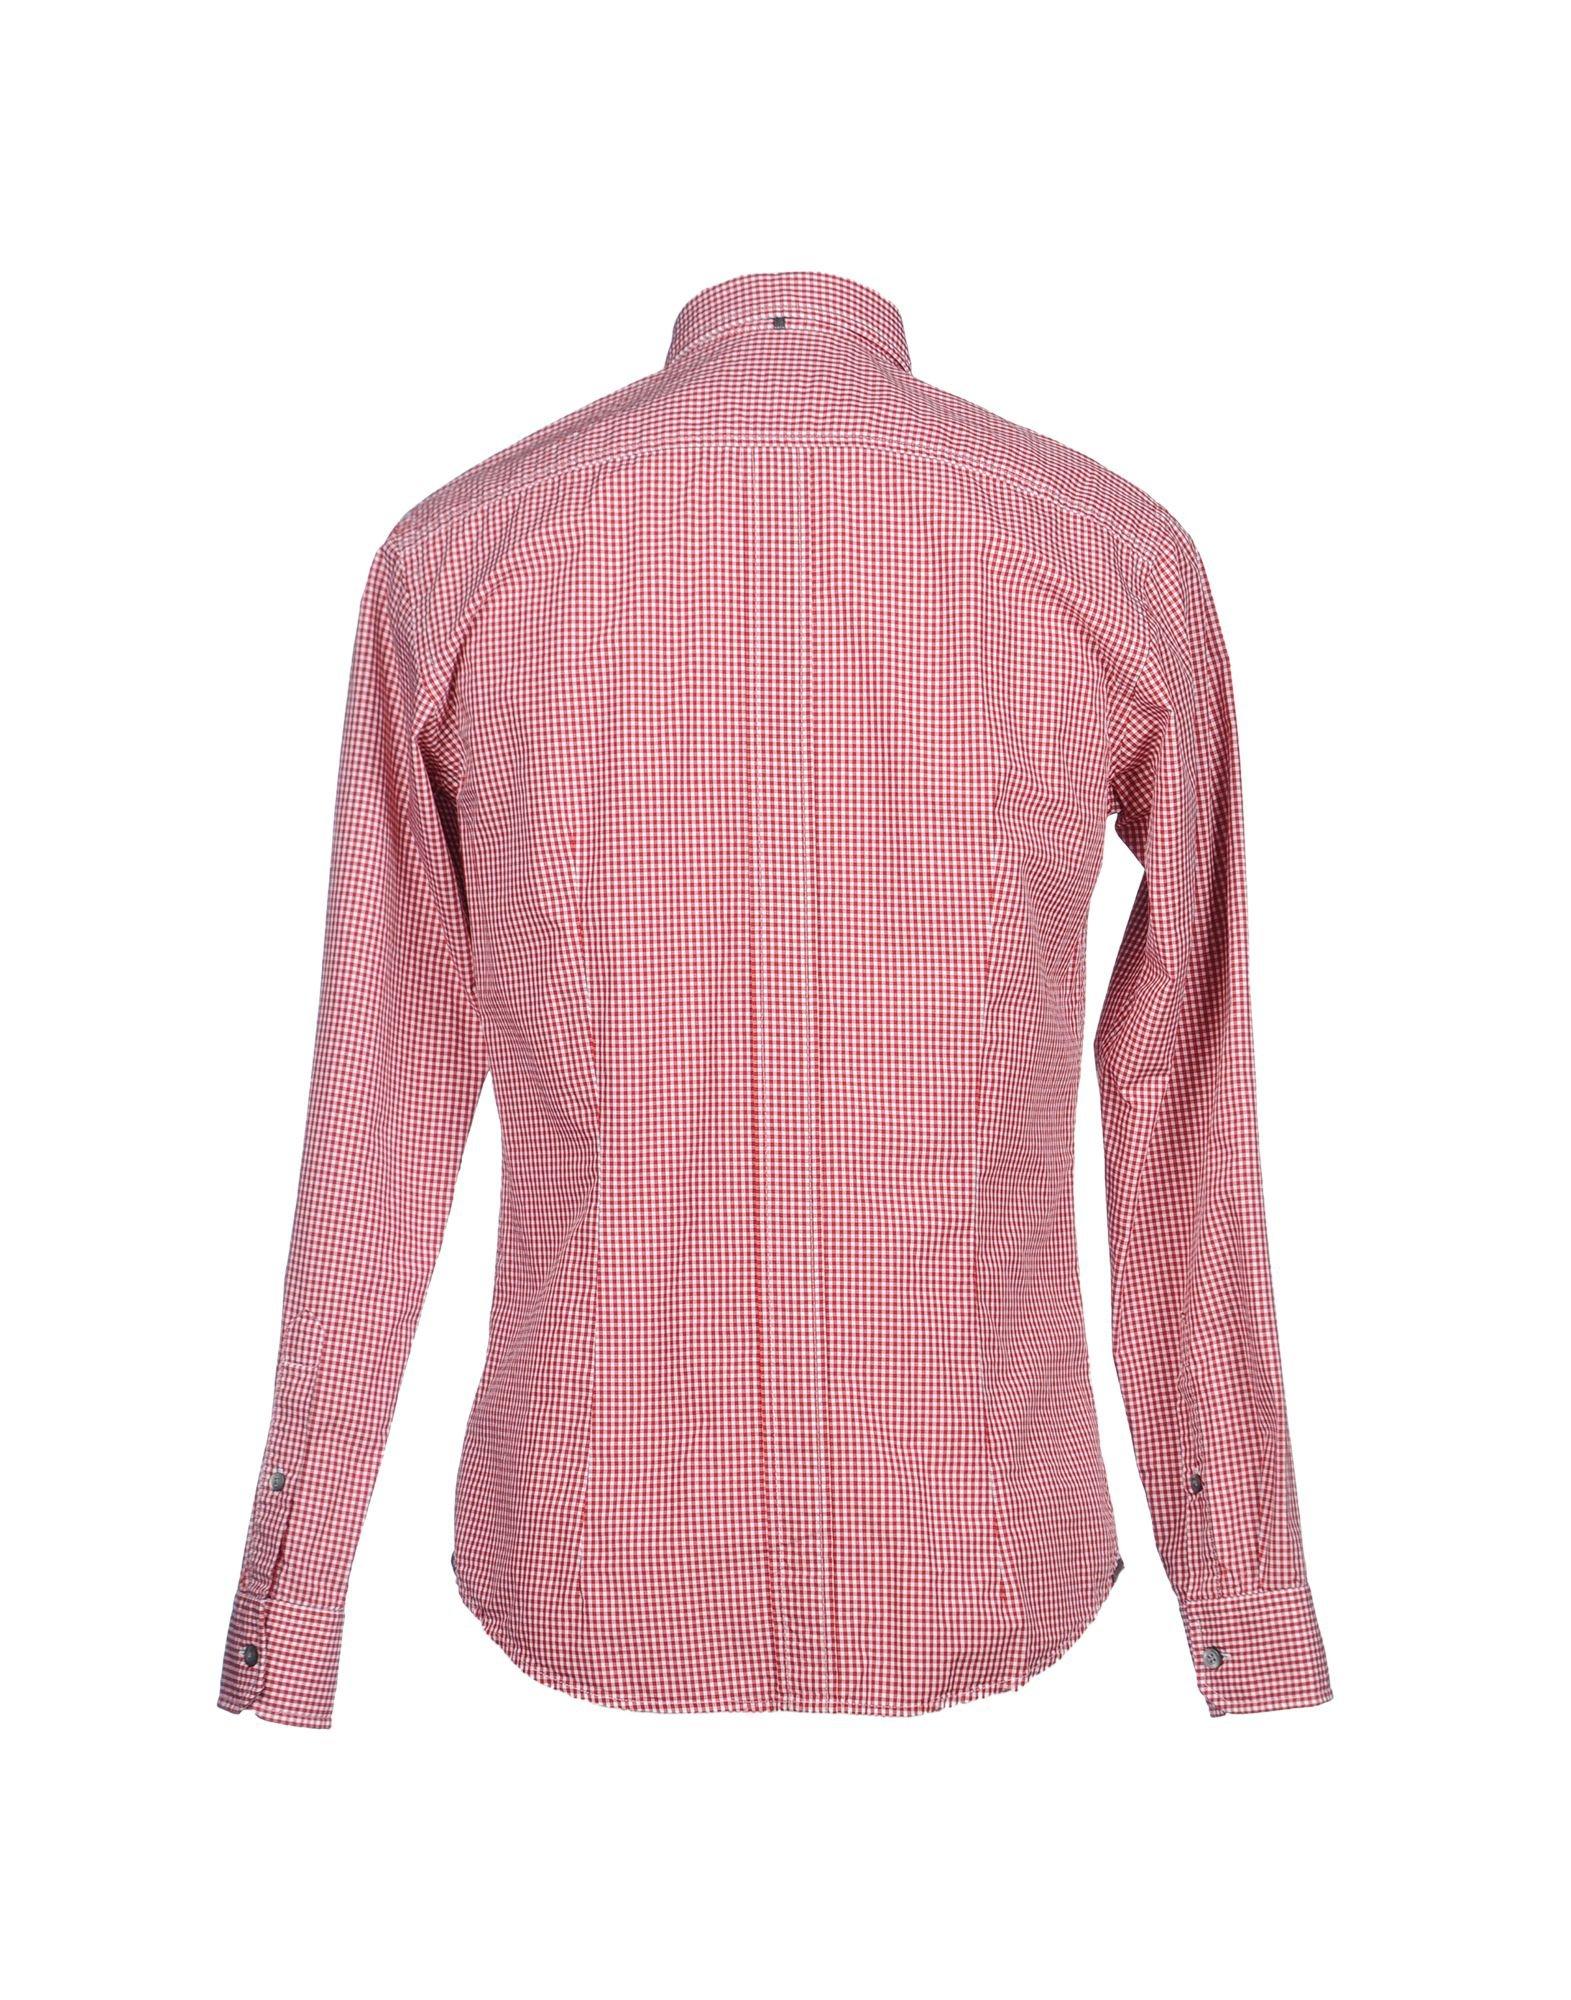 Zegna sport Long Sleeve Shirt in Red for Men